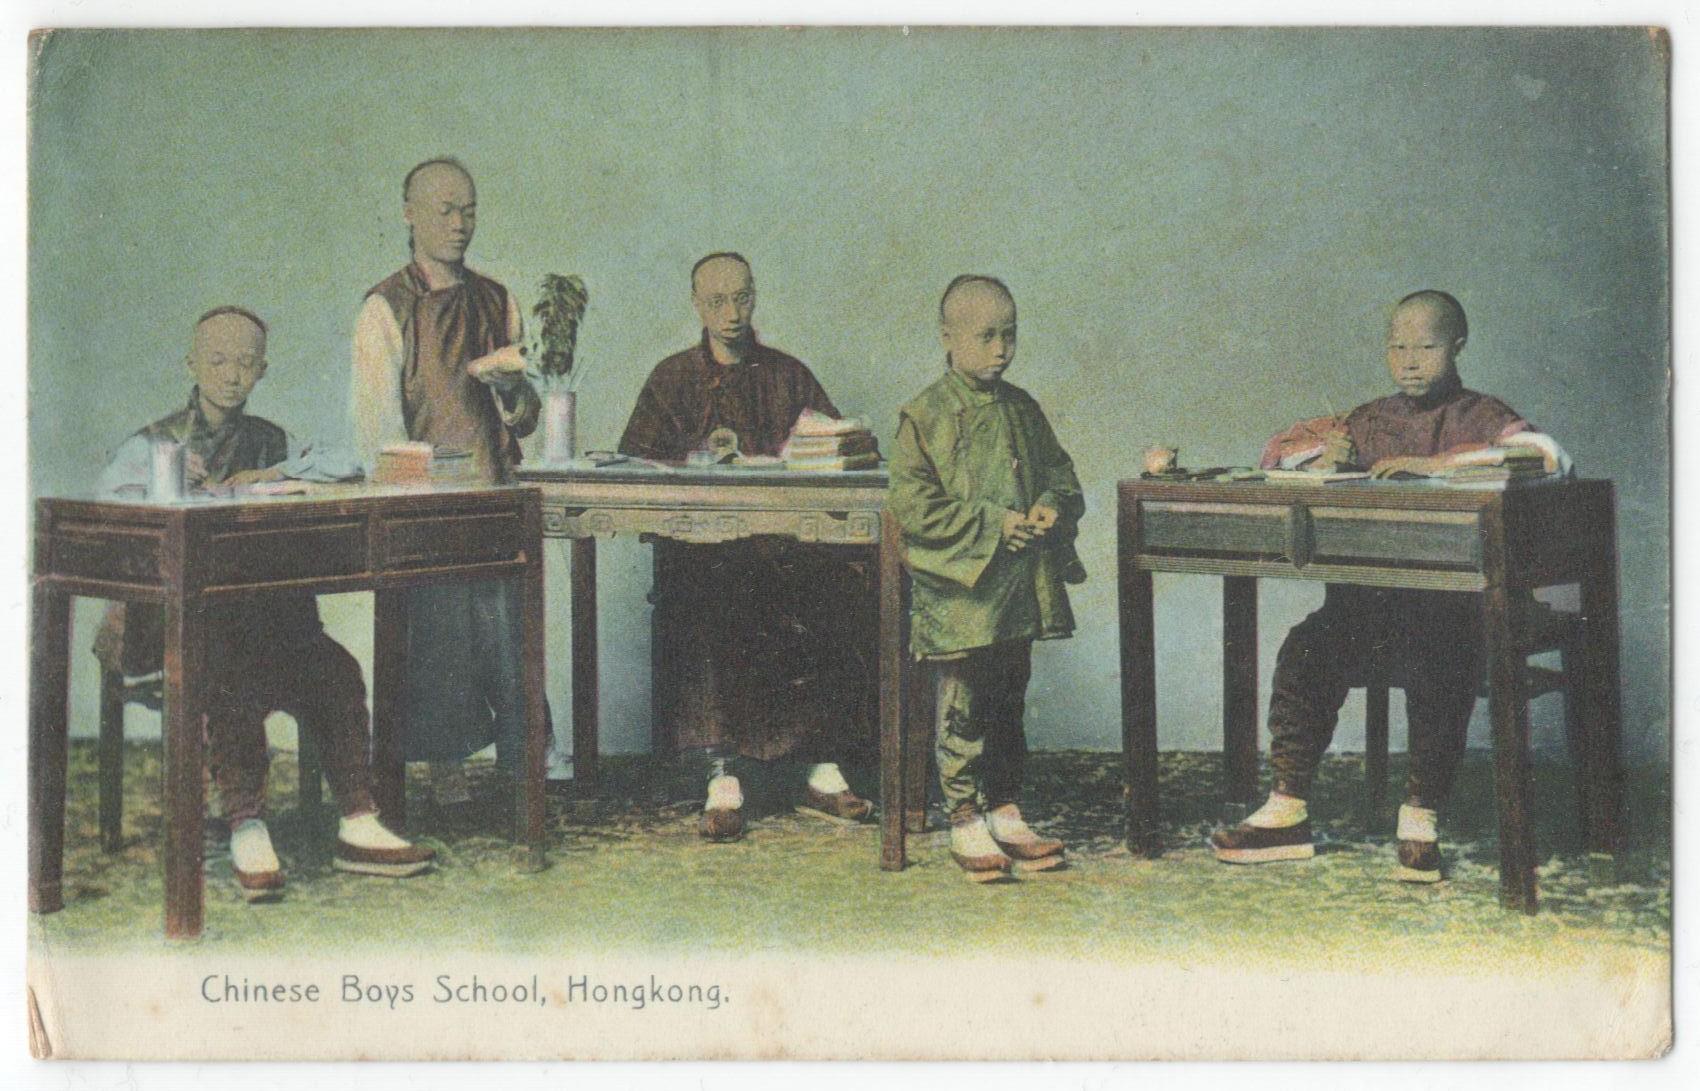 Lot 3 - CHINESE BOYS SCHOOL HONGKONG - POSTED POSTCARD TEMPORARY P.O. CHOWRASTA 1908